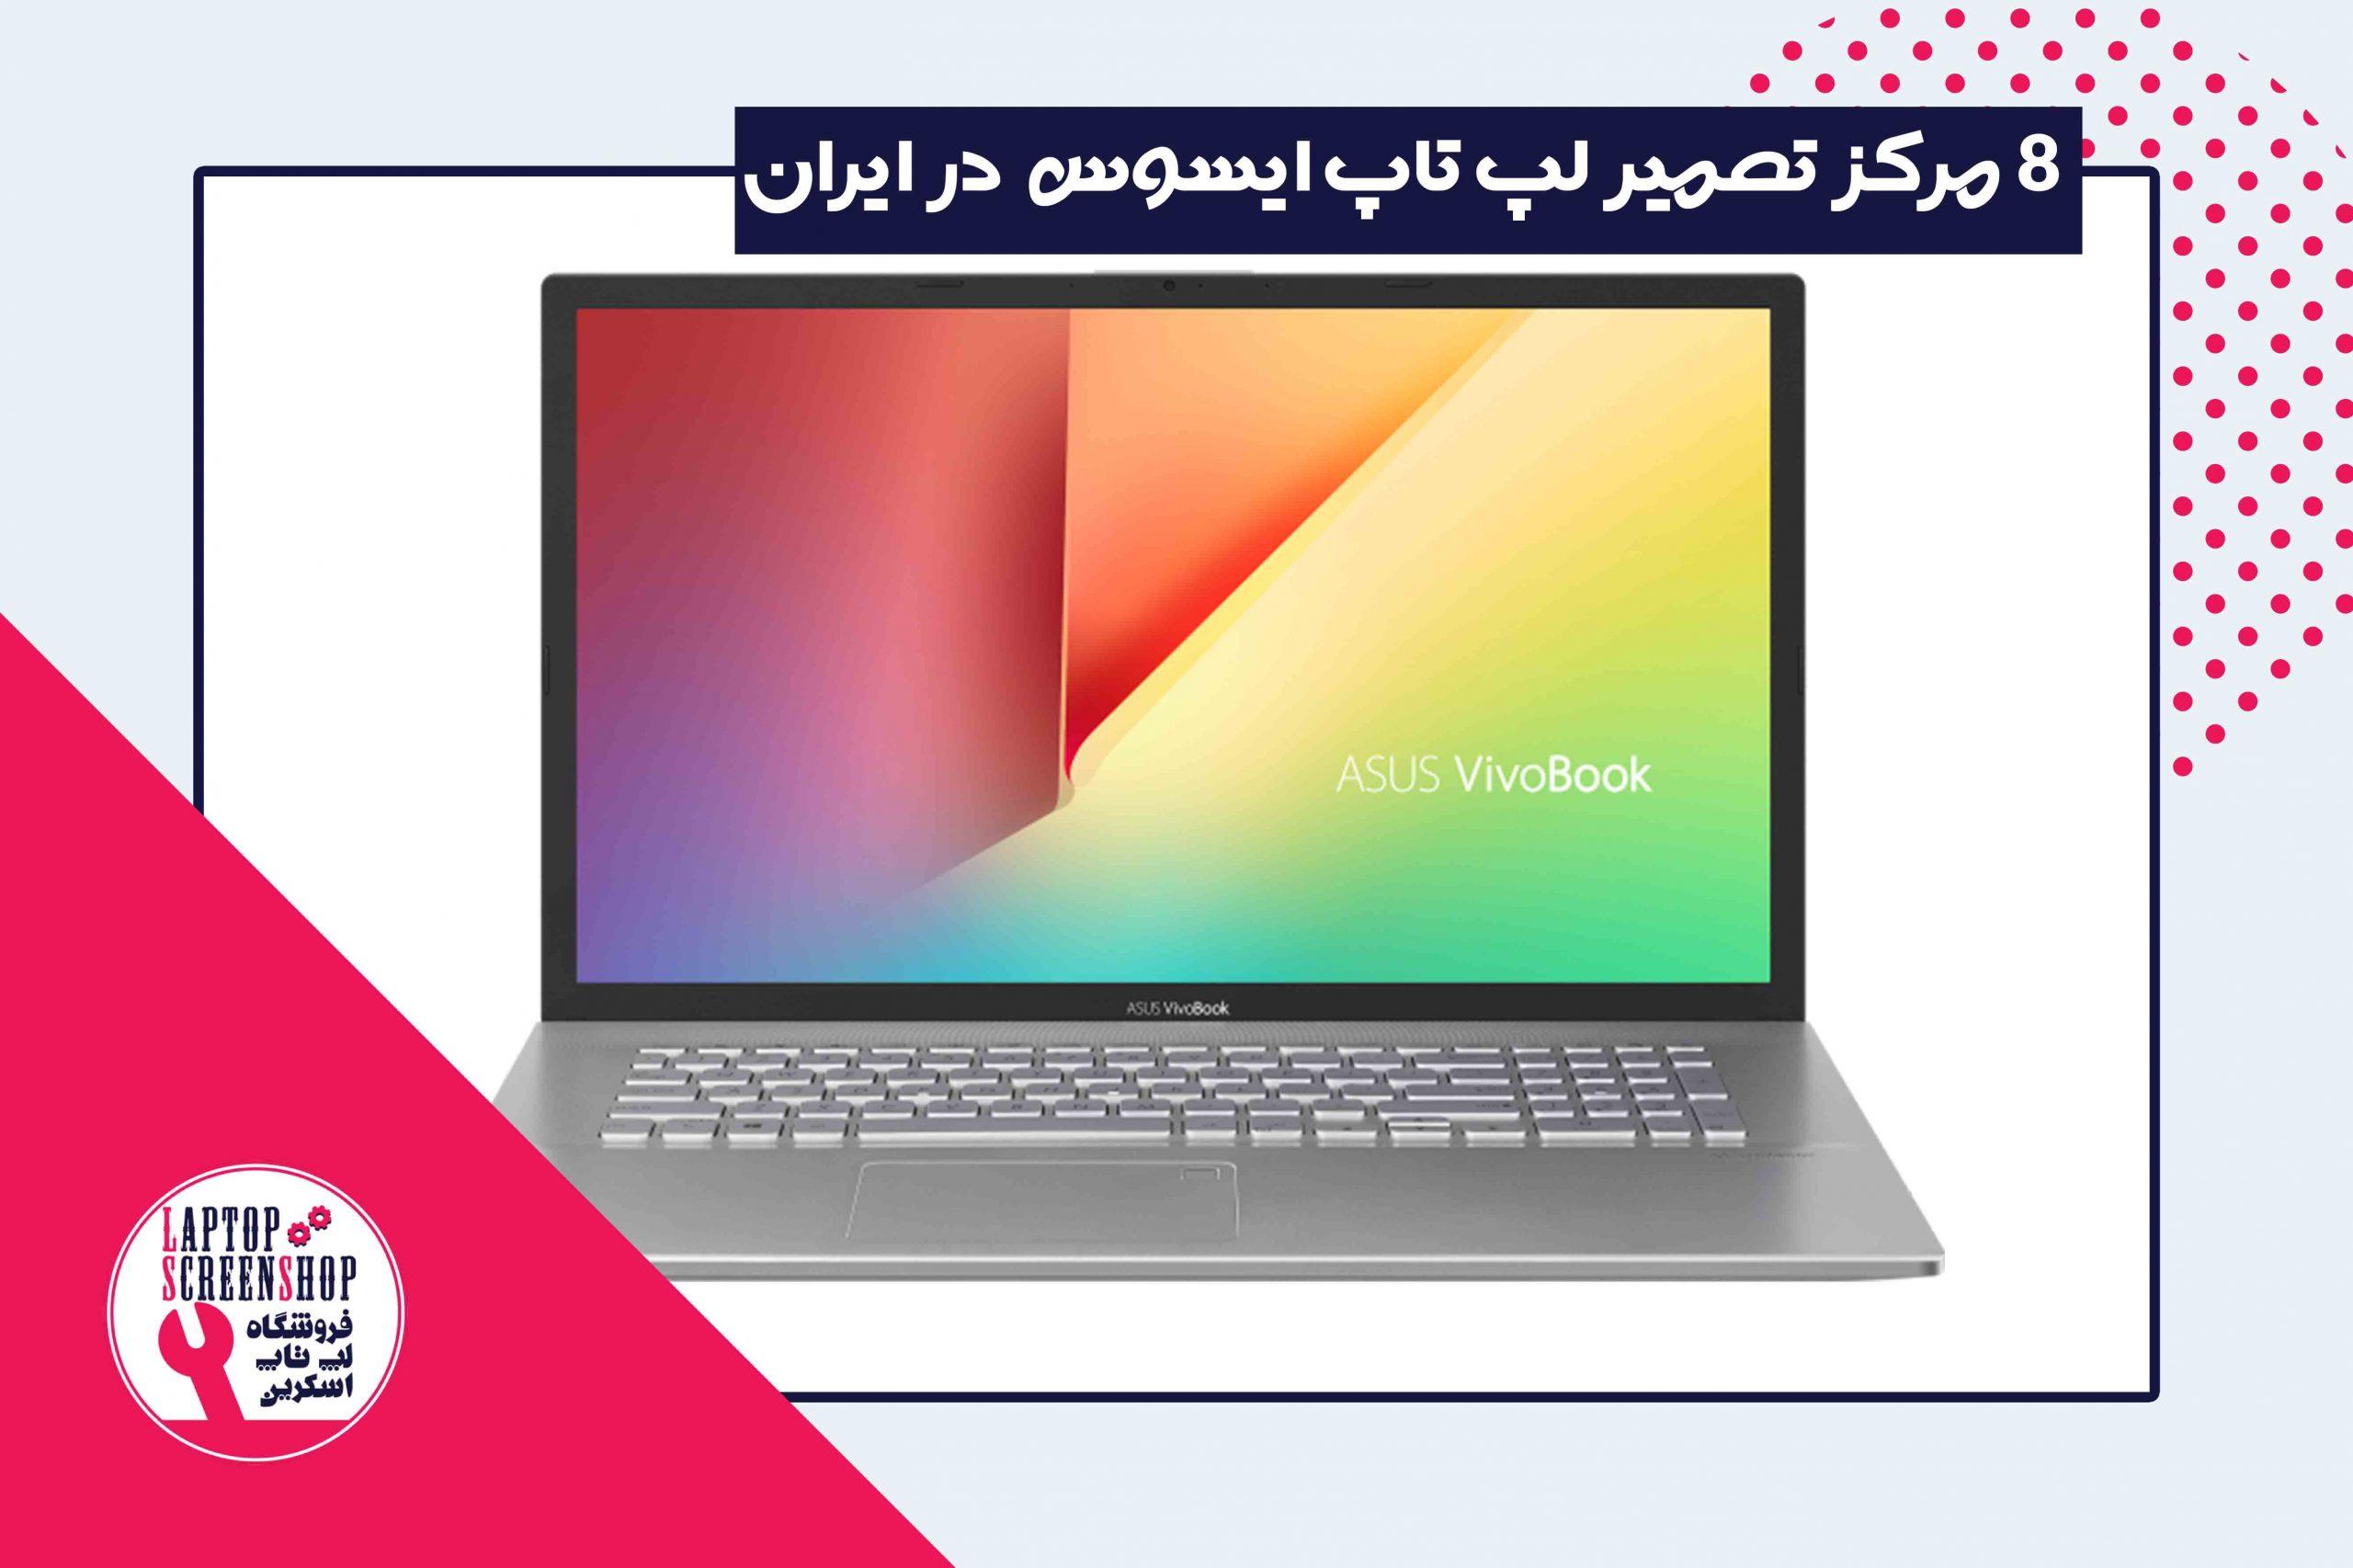 8-asus-laptop-repair-center  لپ تاپ اسکرین  ال سی دی  خرید اینترنتی ال سی دی لپ تاپ  8 نمایندی ایسوس